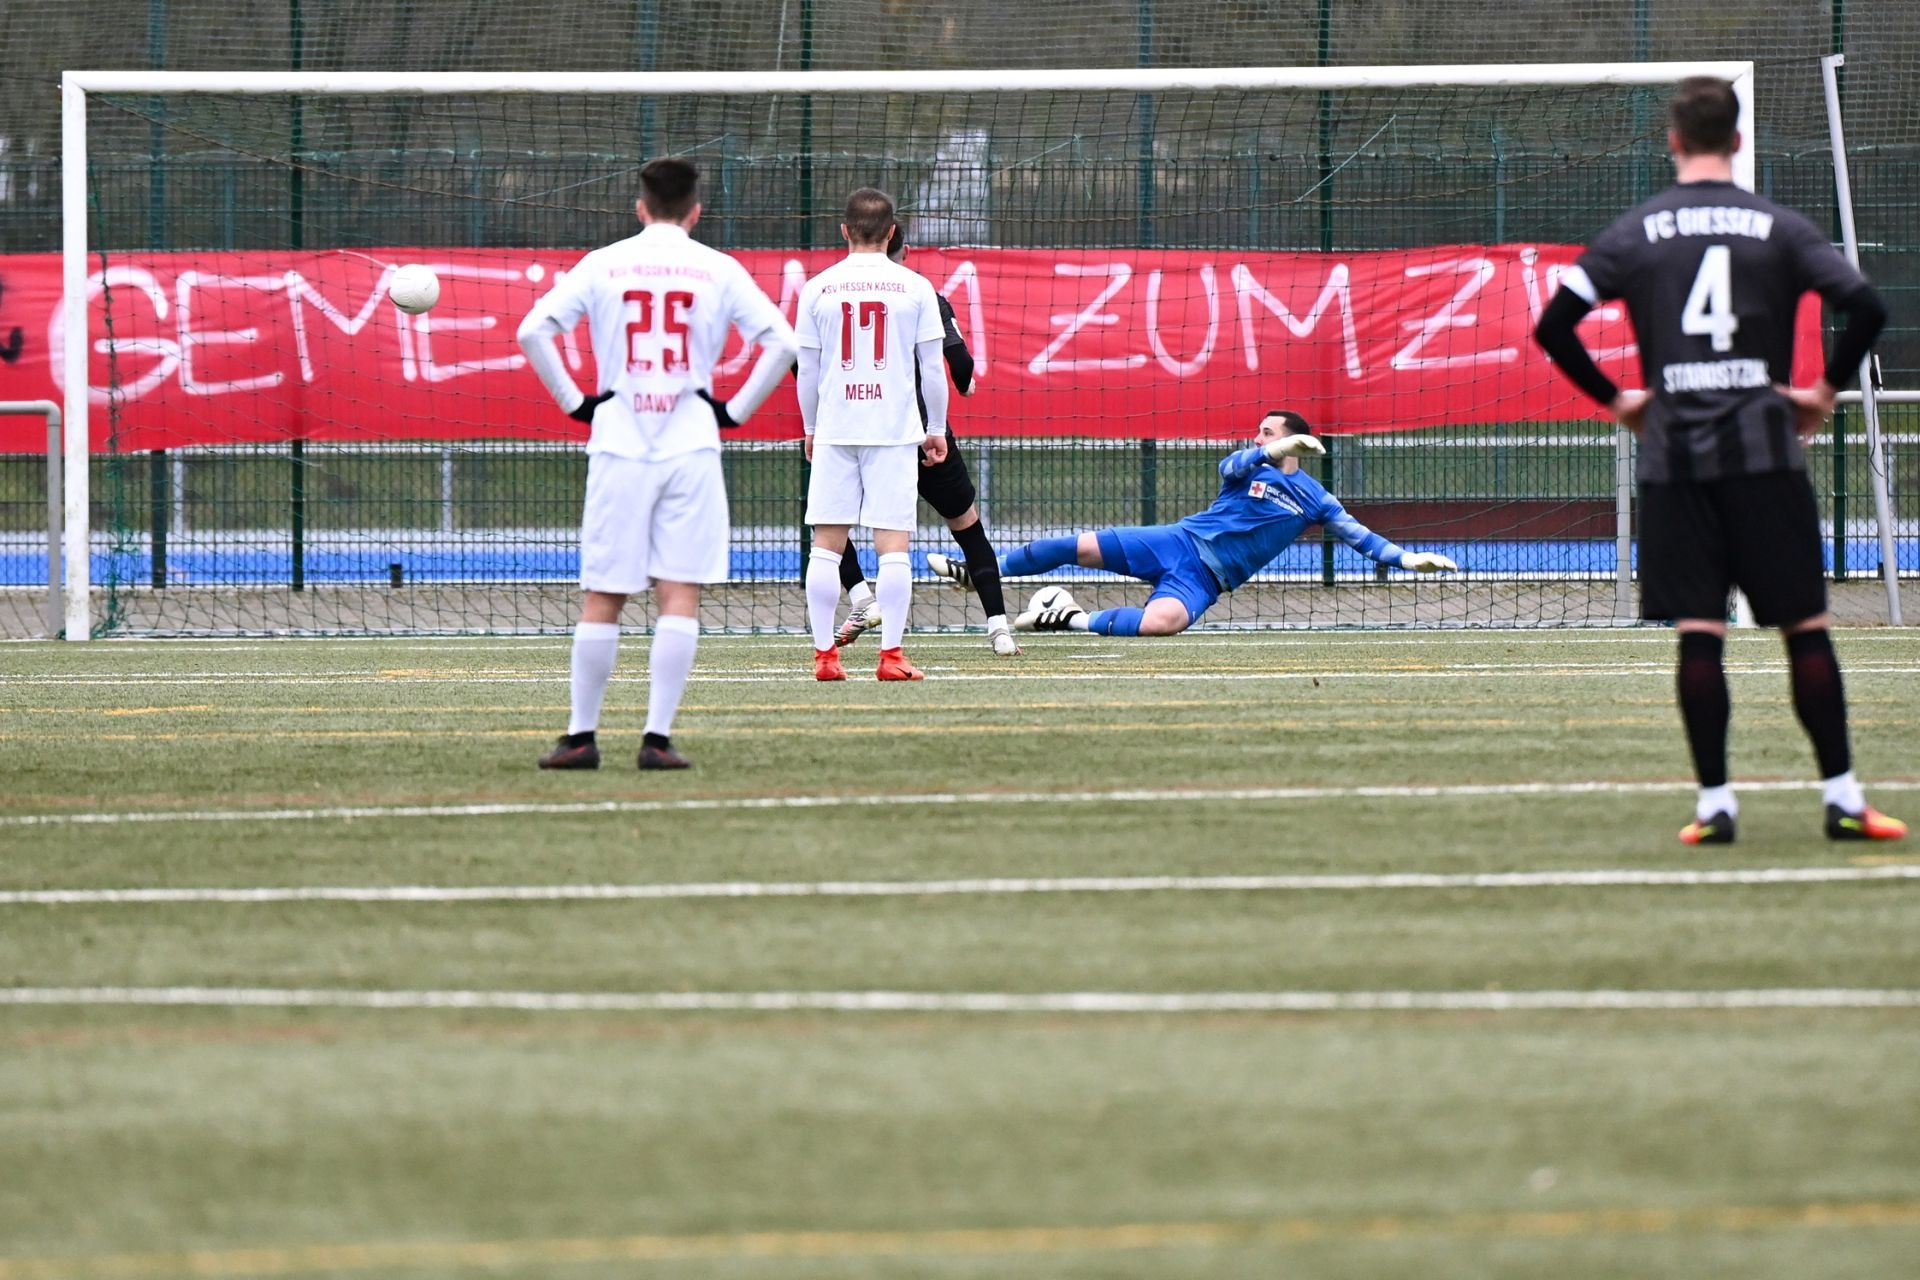 Regionalliga Südwest 2020/21, KSVHessen Kassel, FC Gießen, Endstand 1:1, Tor zum 0:1